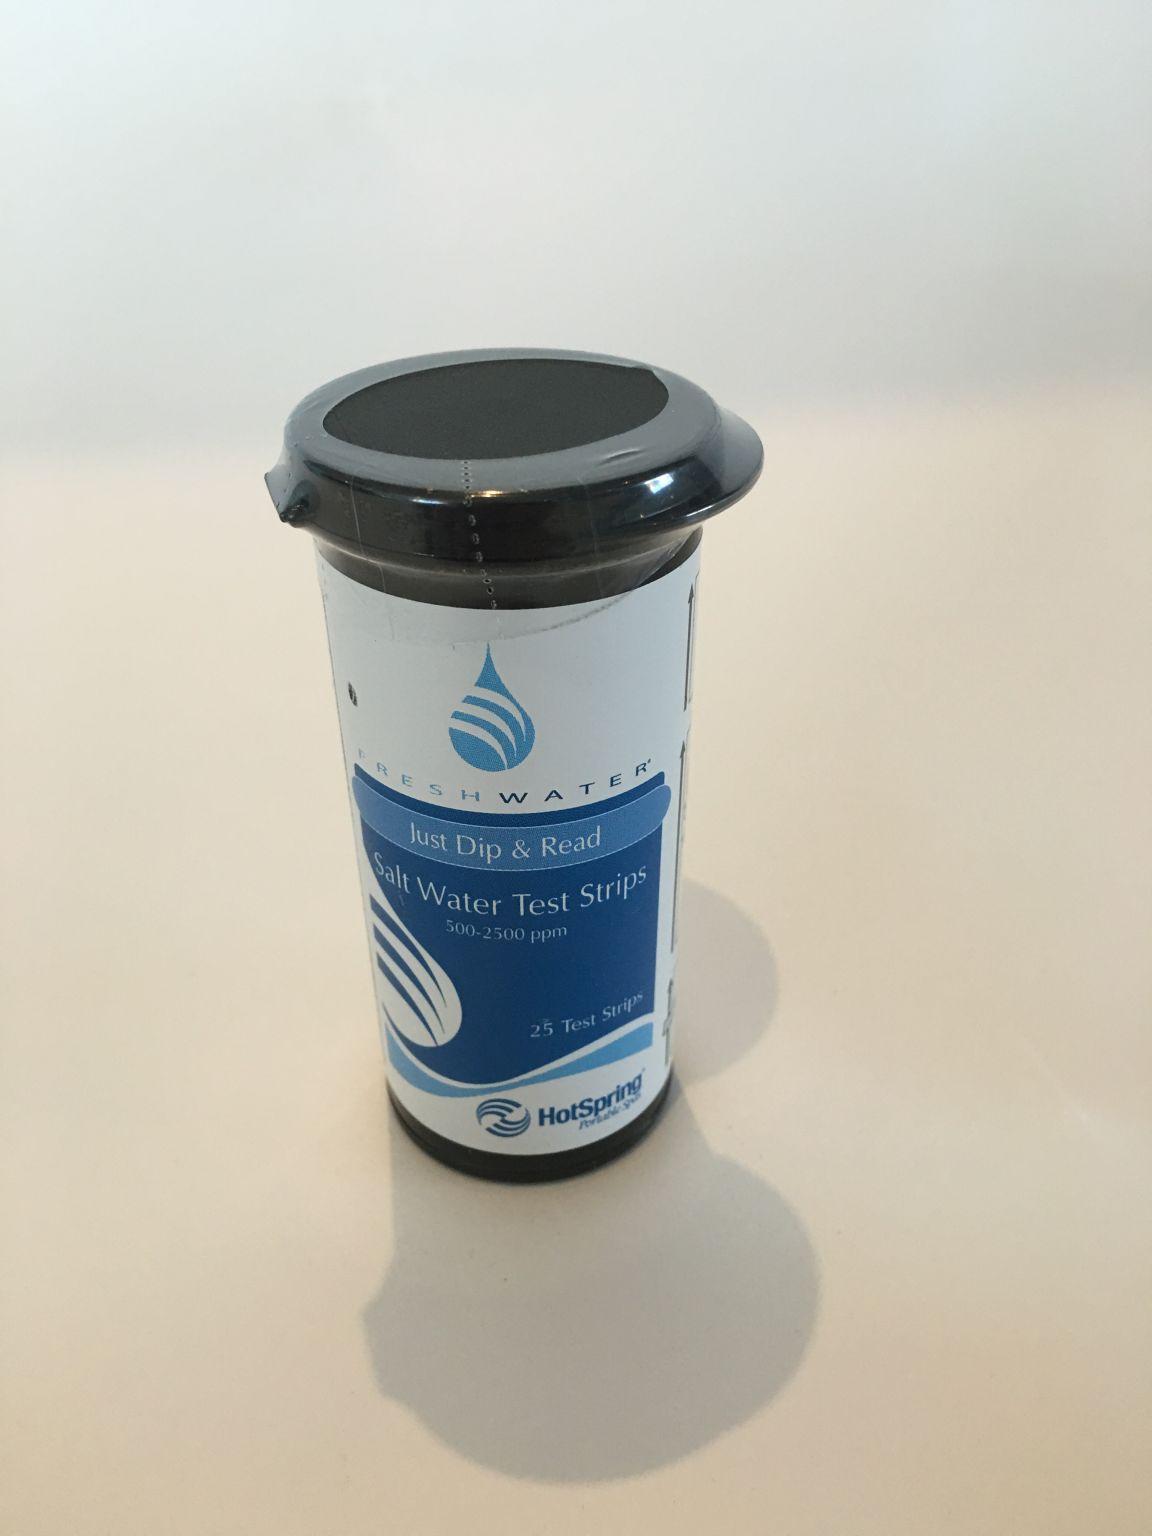 Hotspring Salt Water Test Strips Brisbane Spa Super Centre